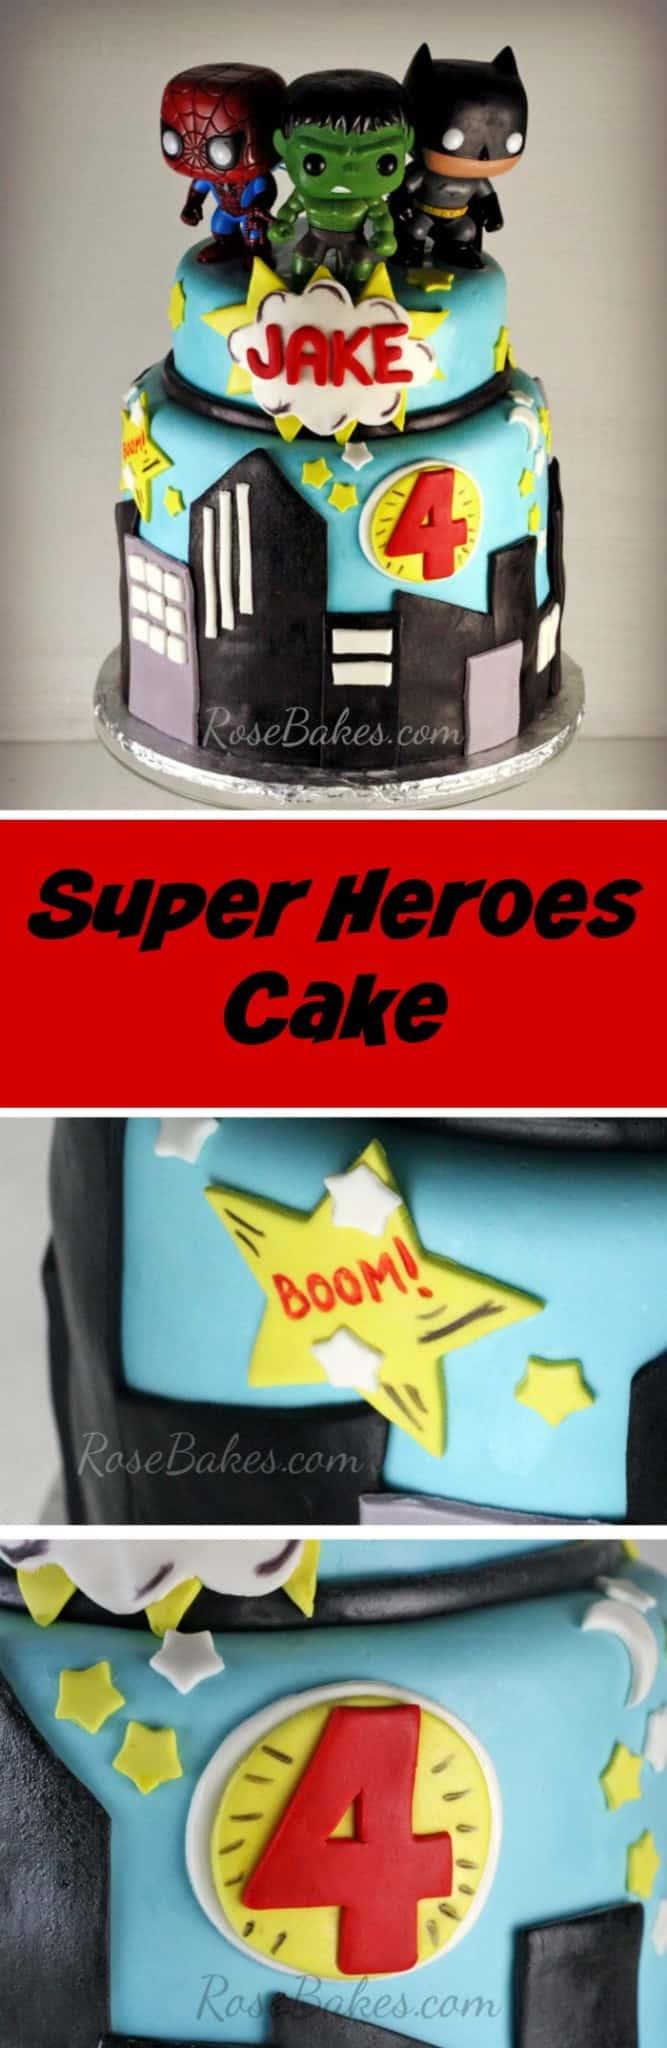 Super Heroes Cake by RoseBakes